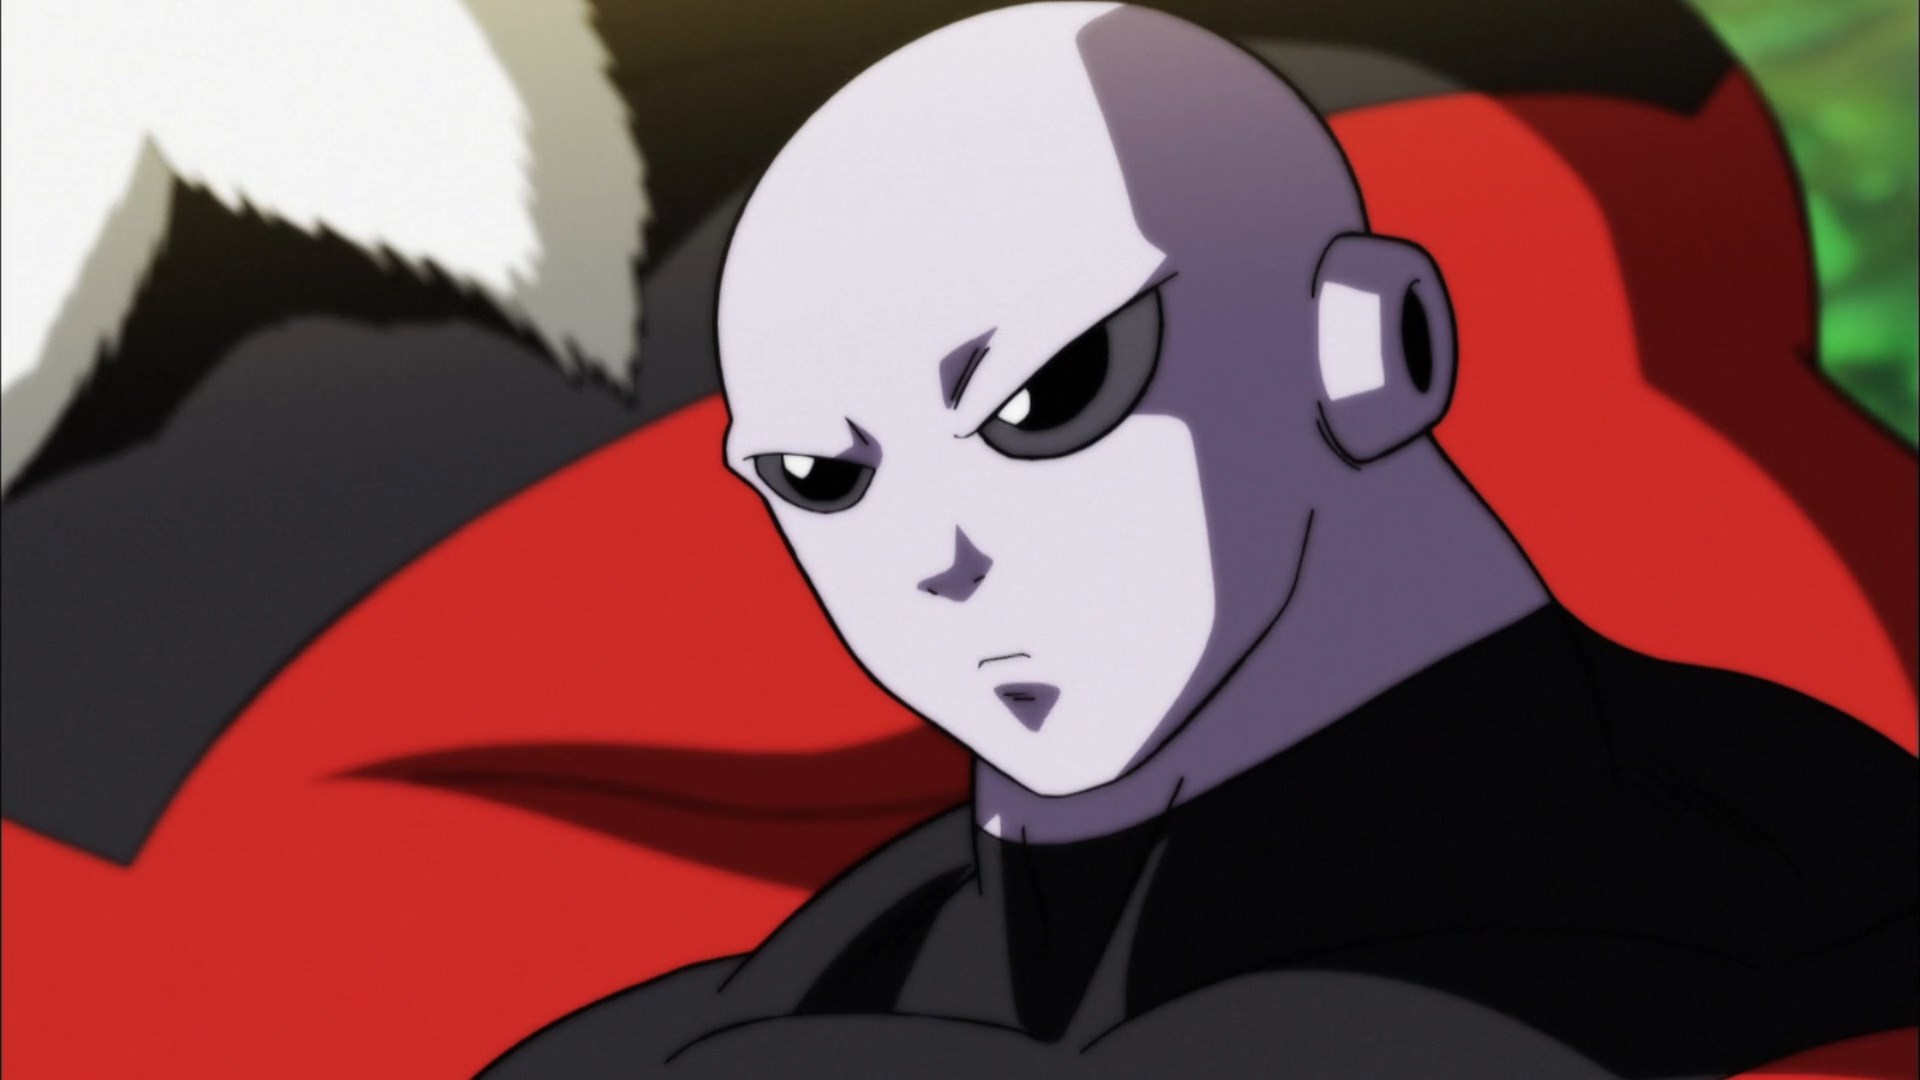 [HorribleSubs] Dragon Ball Super - 121 [1080p].mkv_snapshot_21.34